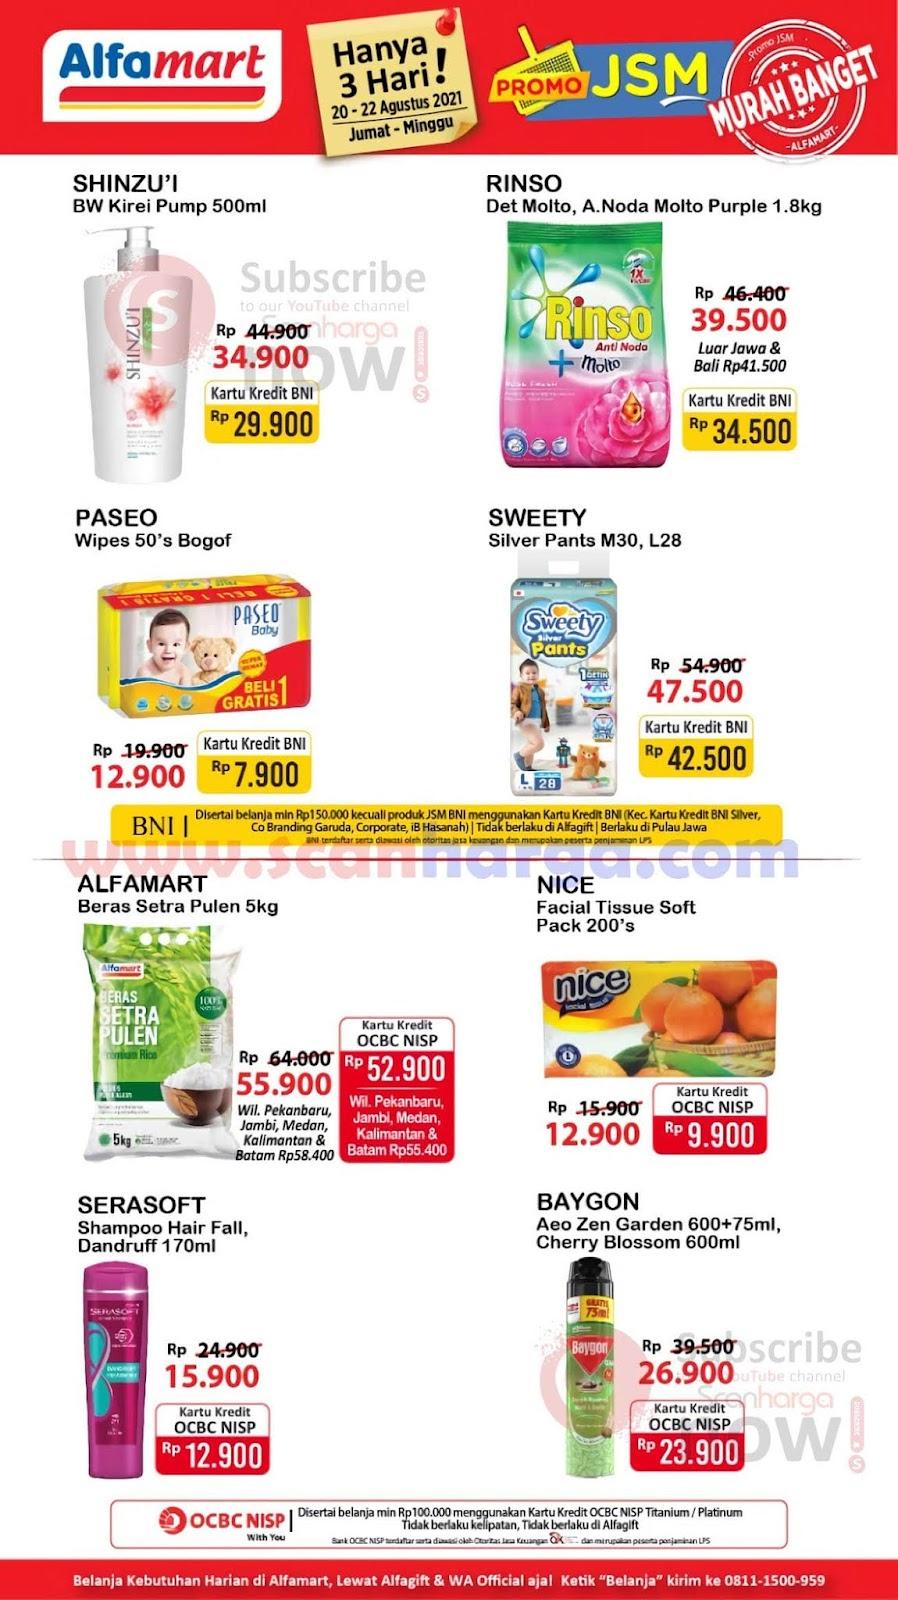 Katalog Promo JSM Alfamart Weekend 20 - 22 Agustus 2021 3